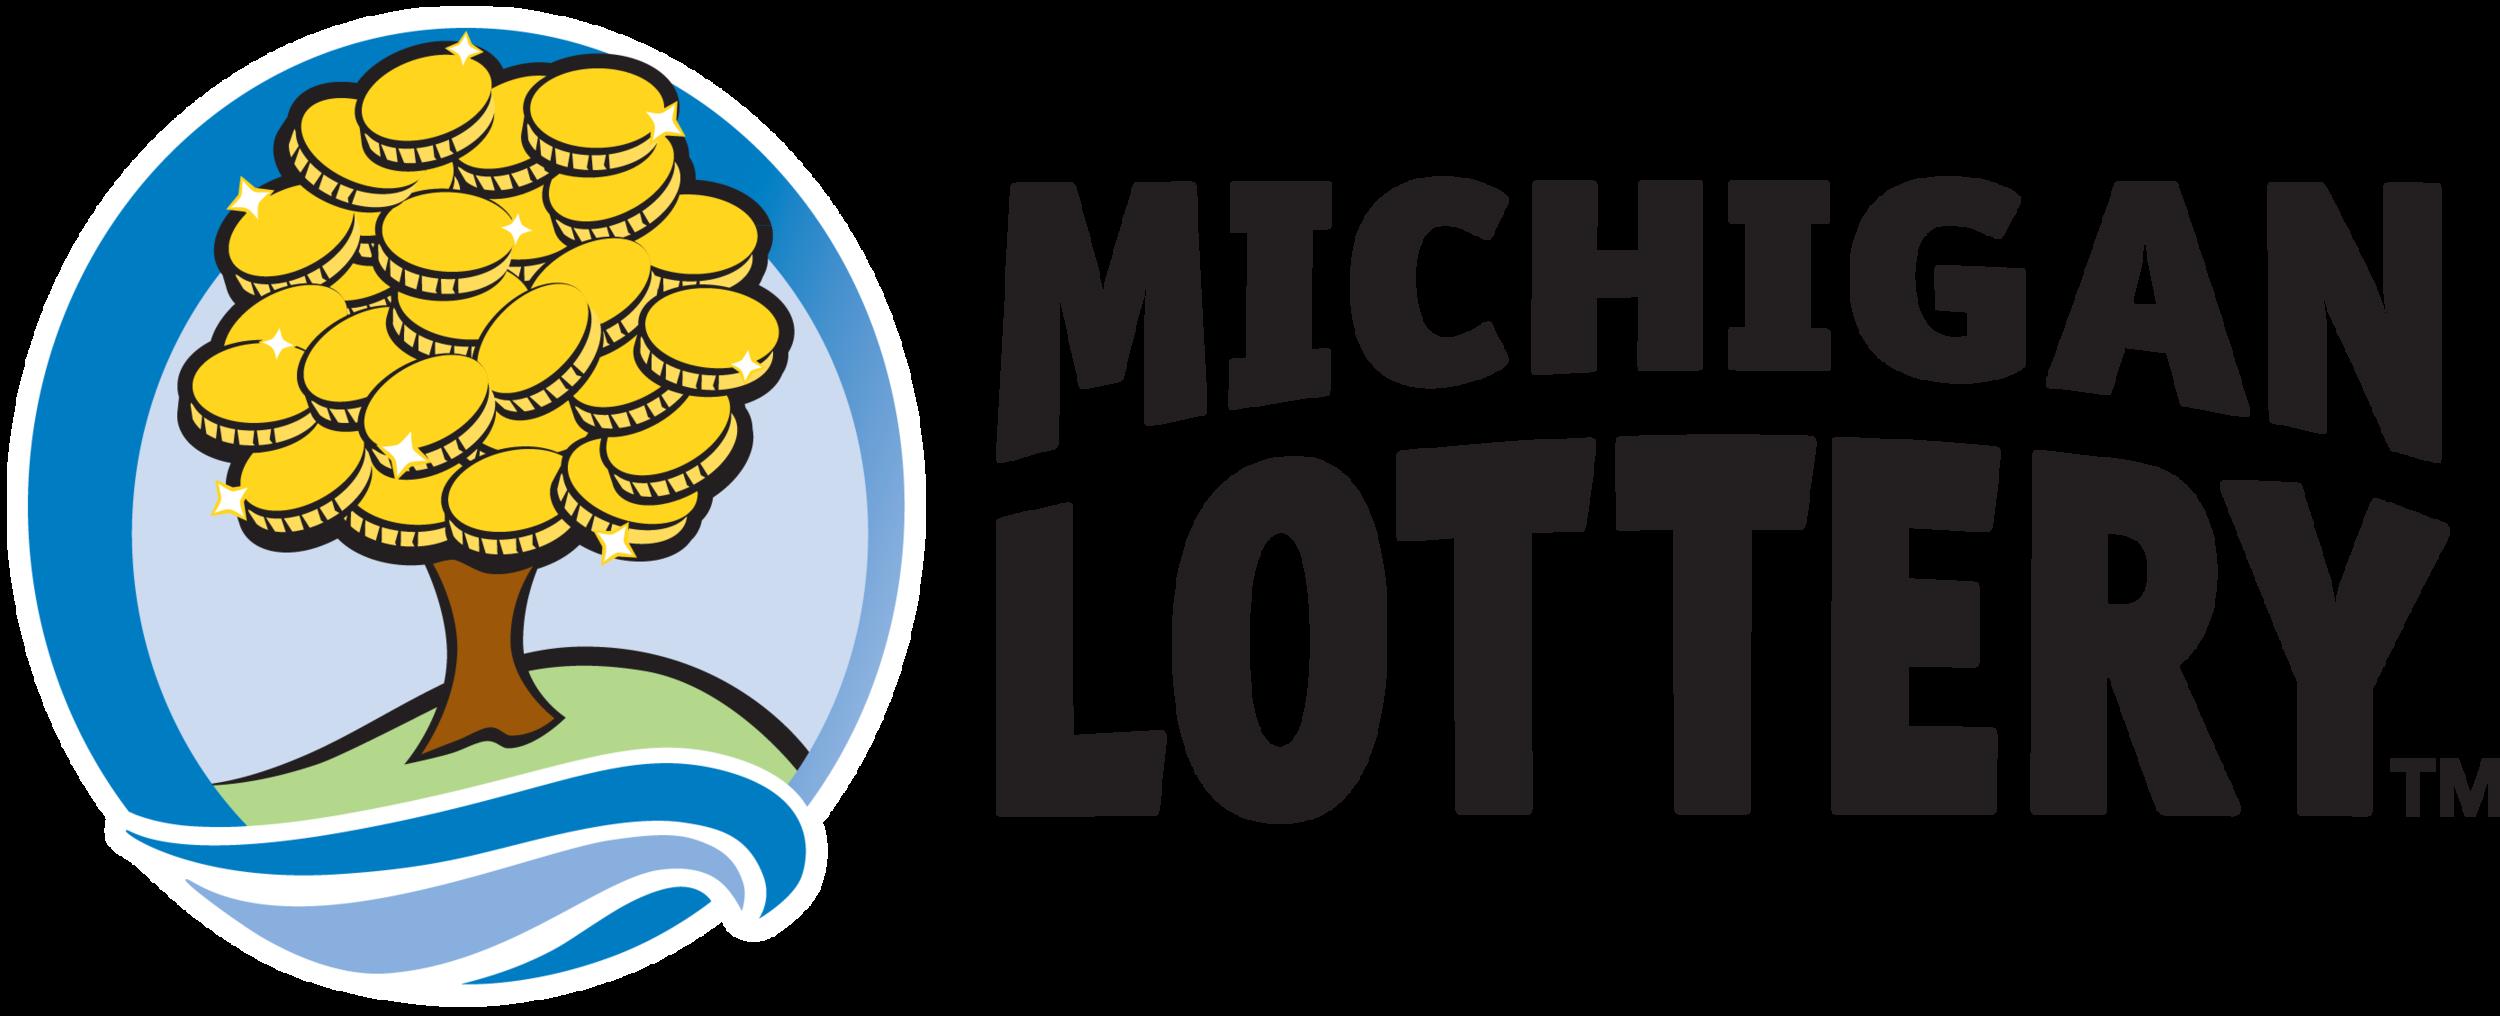 milottery-horz-logo.png